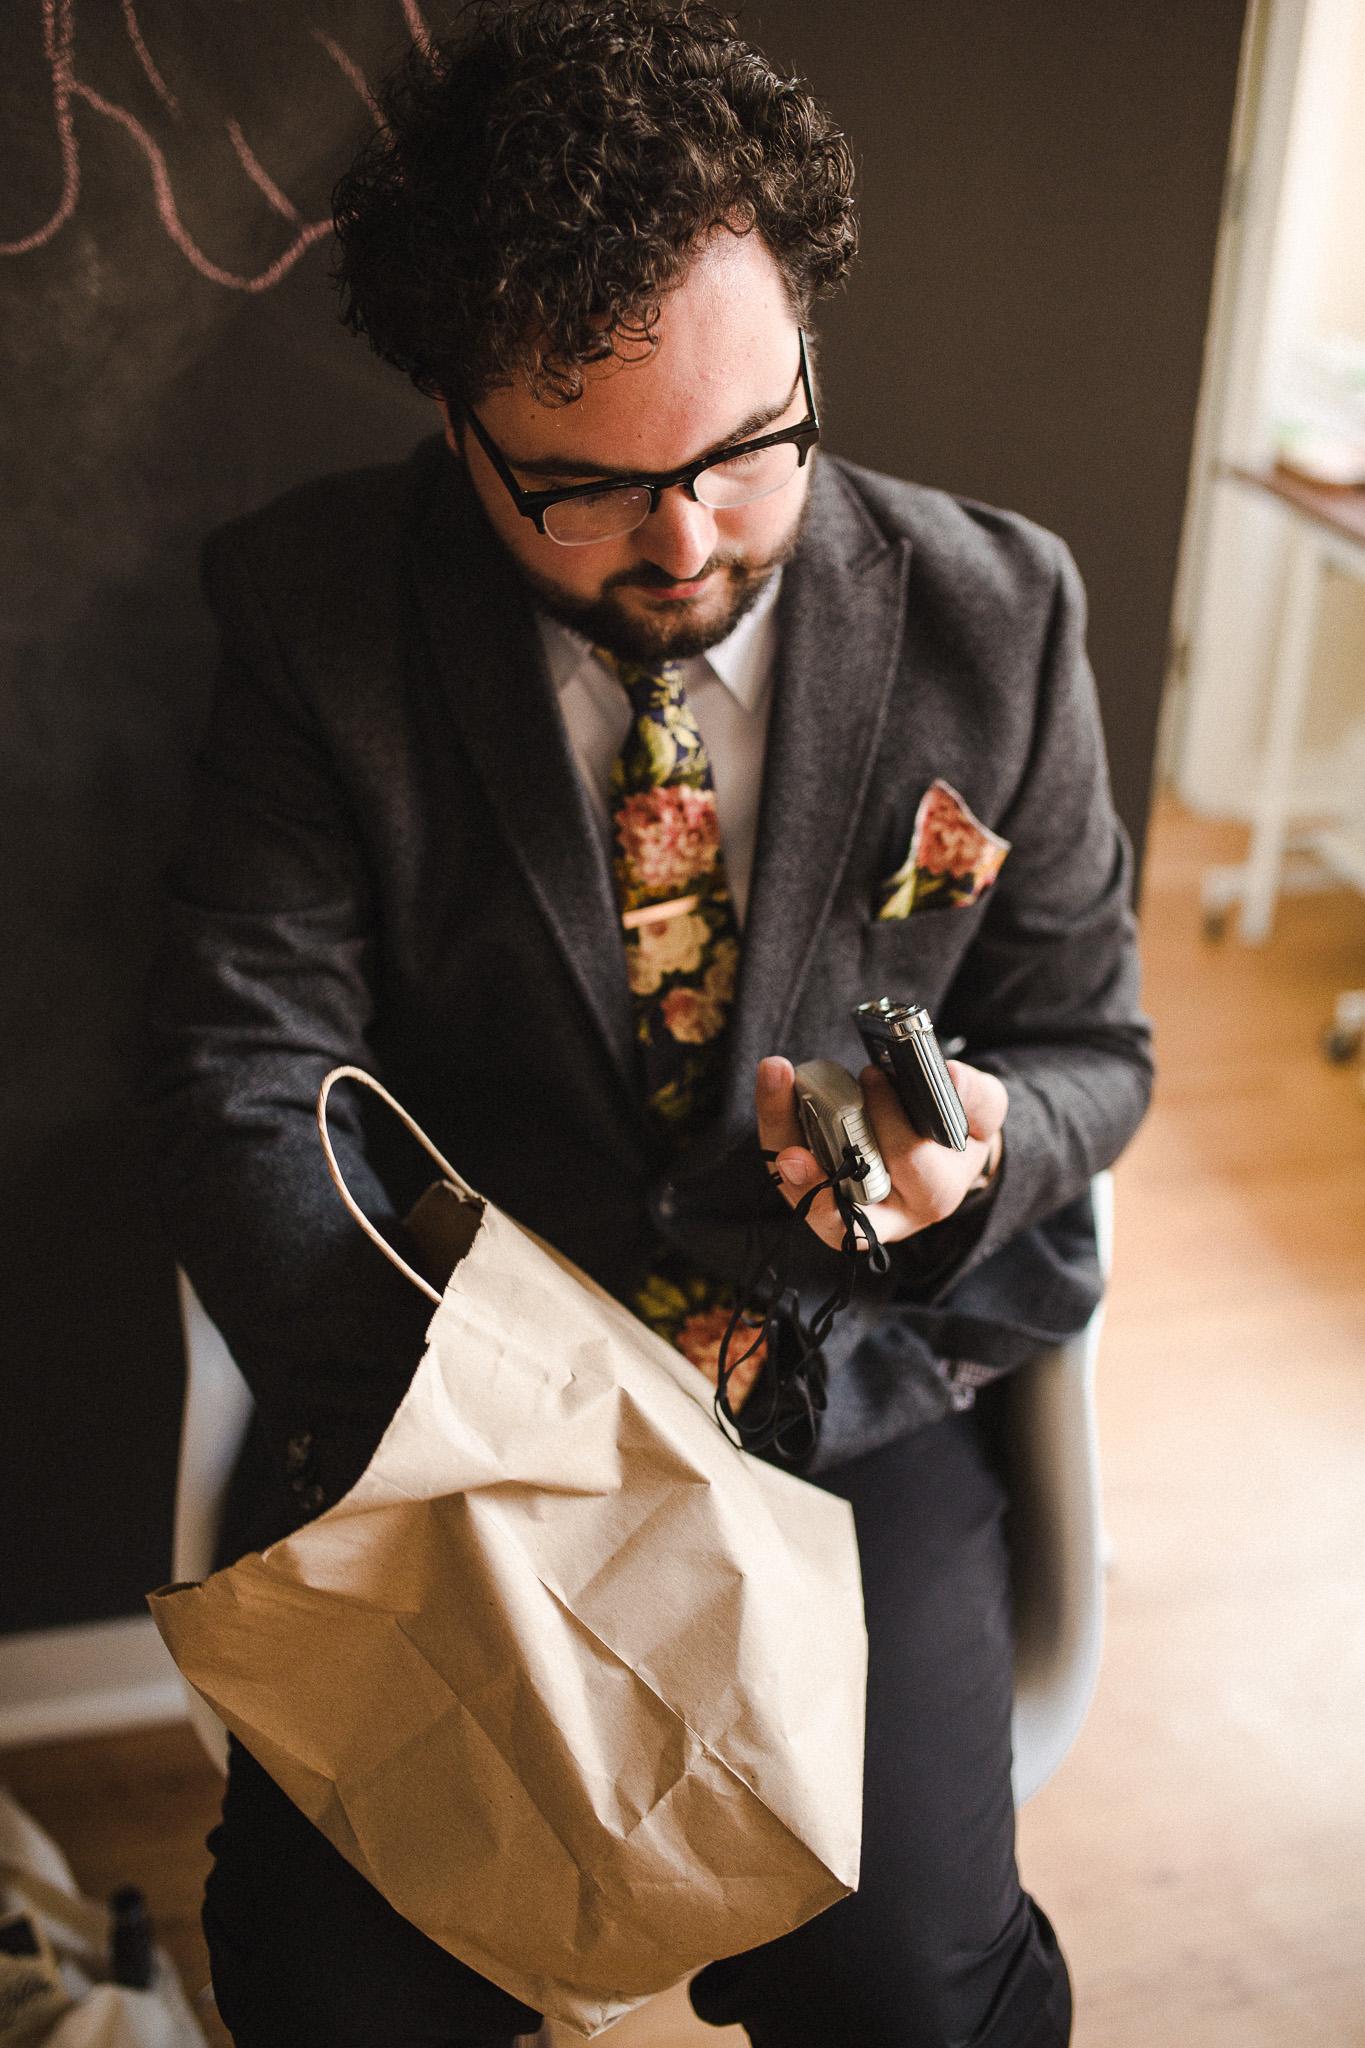 Orlando-Wedding-Photographer (25 of 46).JPG